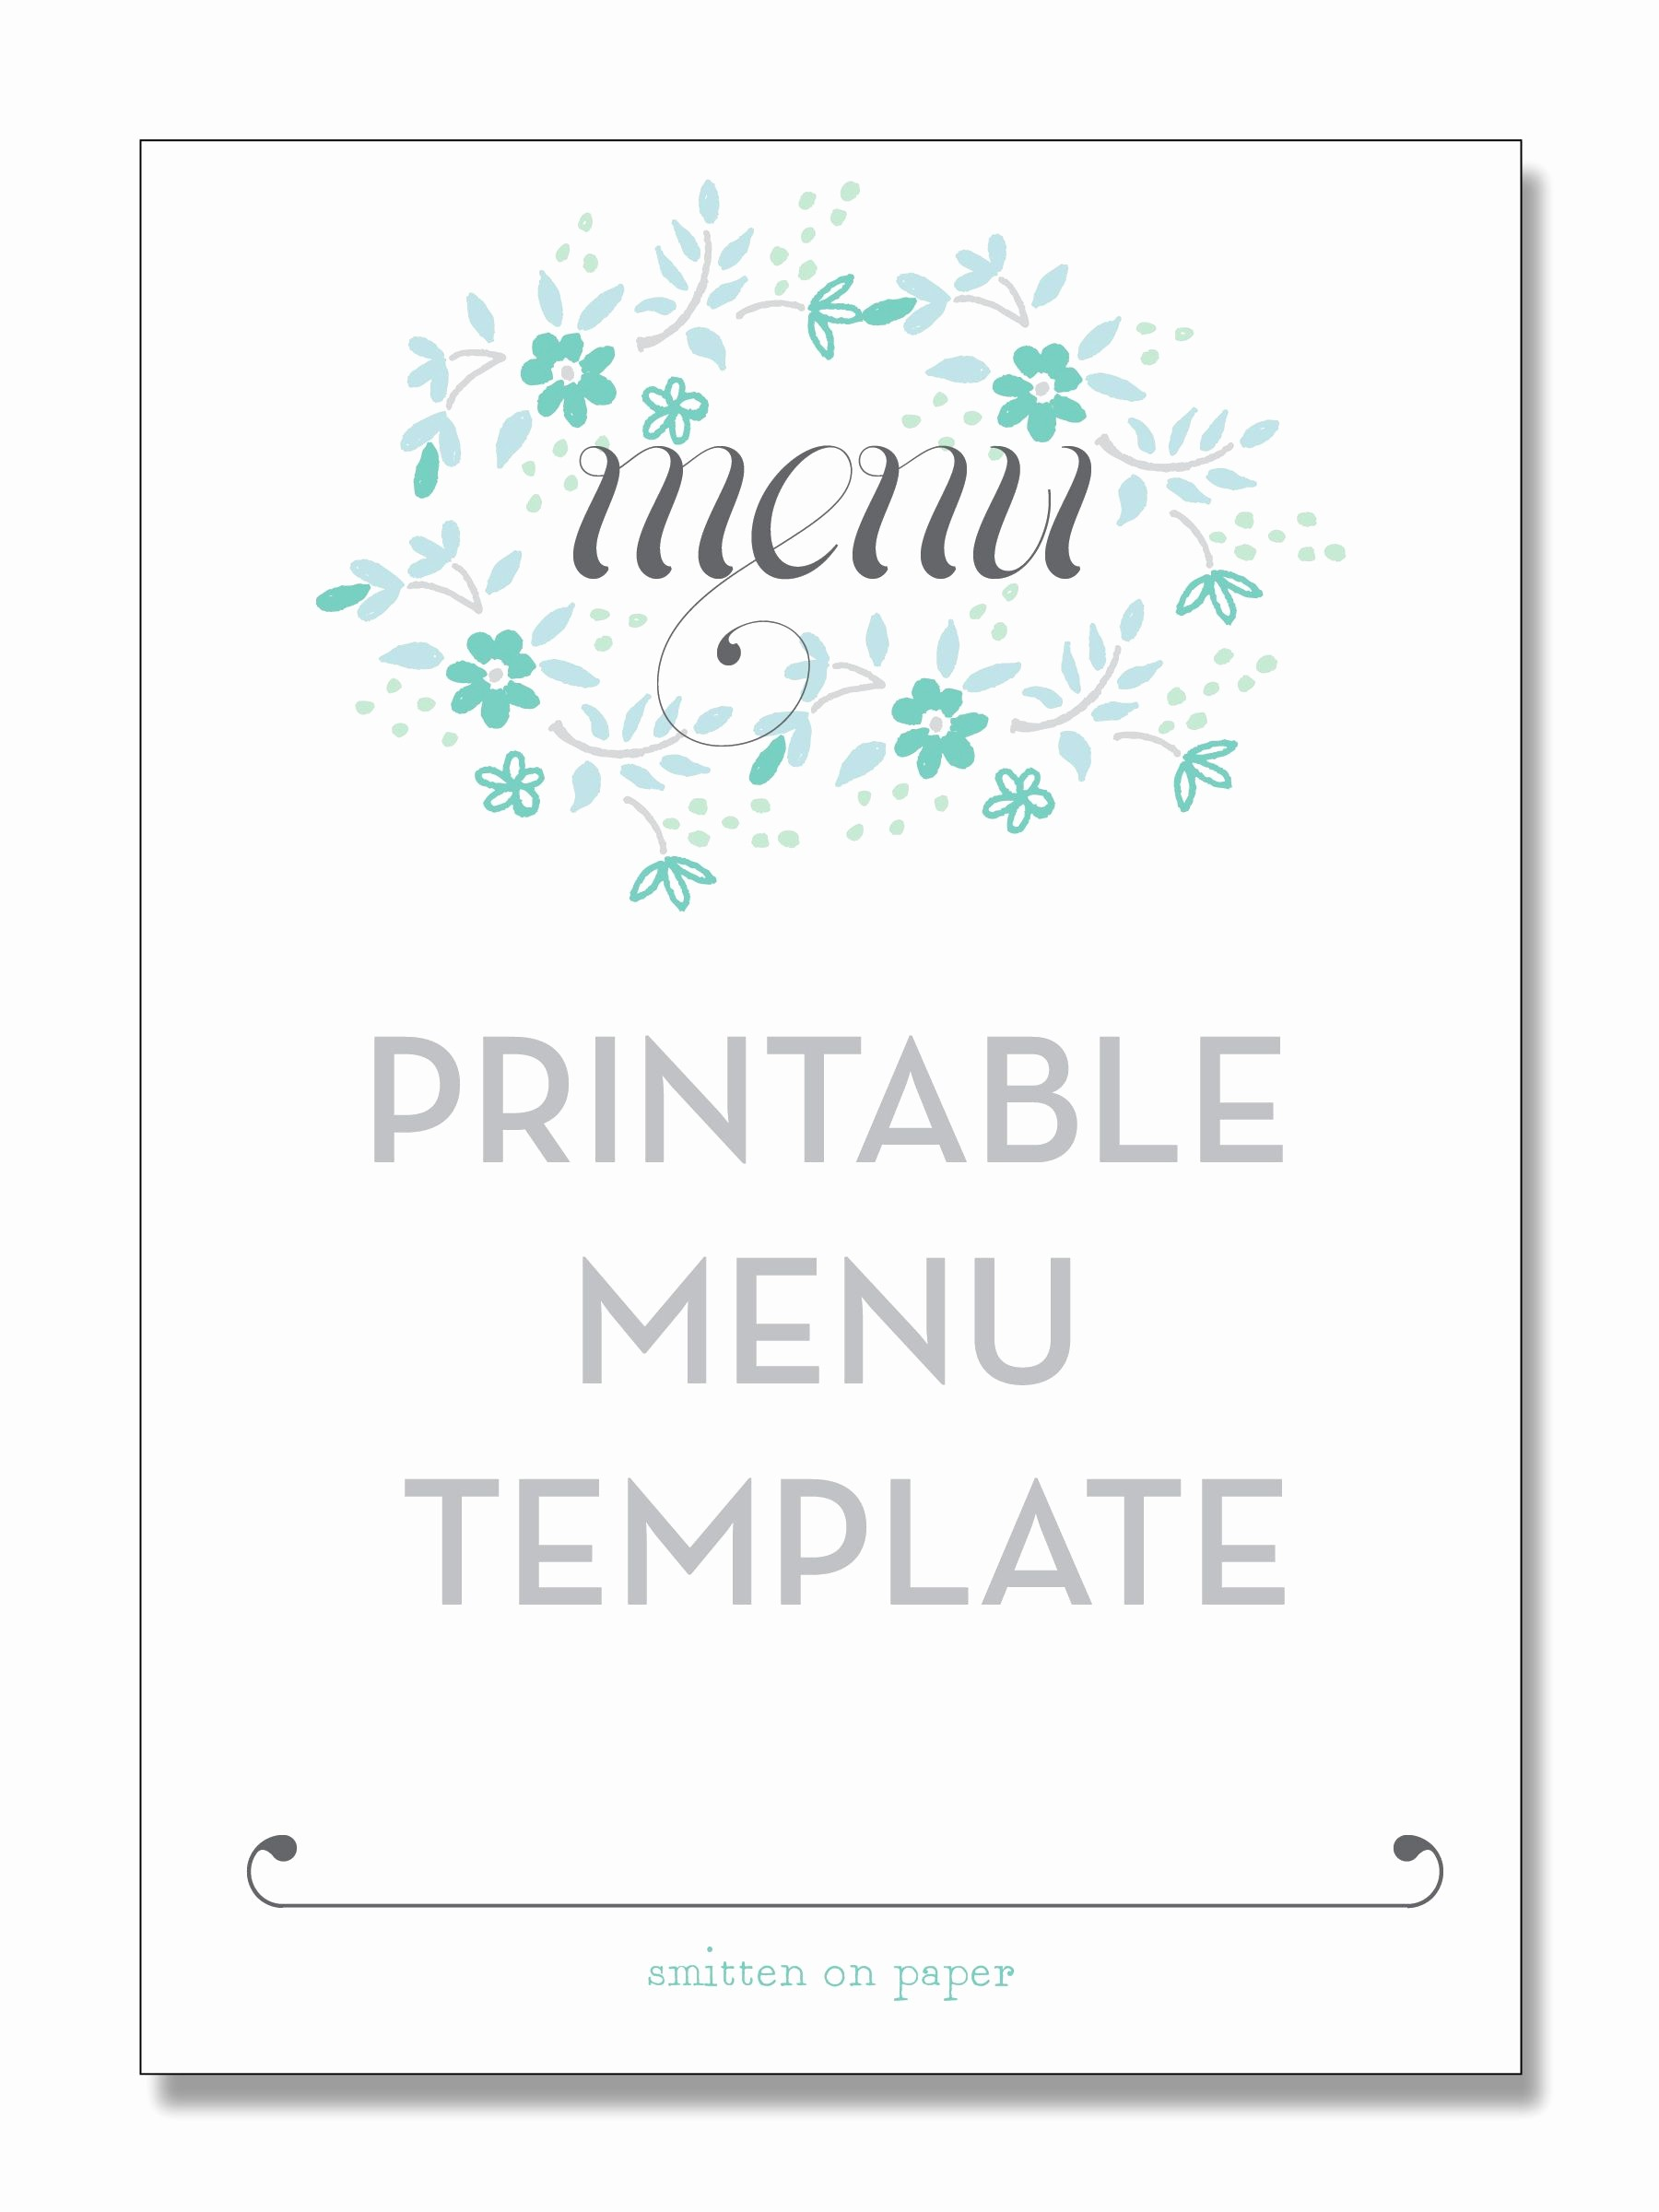 Free Editable Restaurant Menu Templates Unique Freebie Friday Printable Menu Party Time